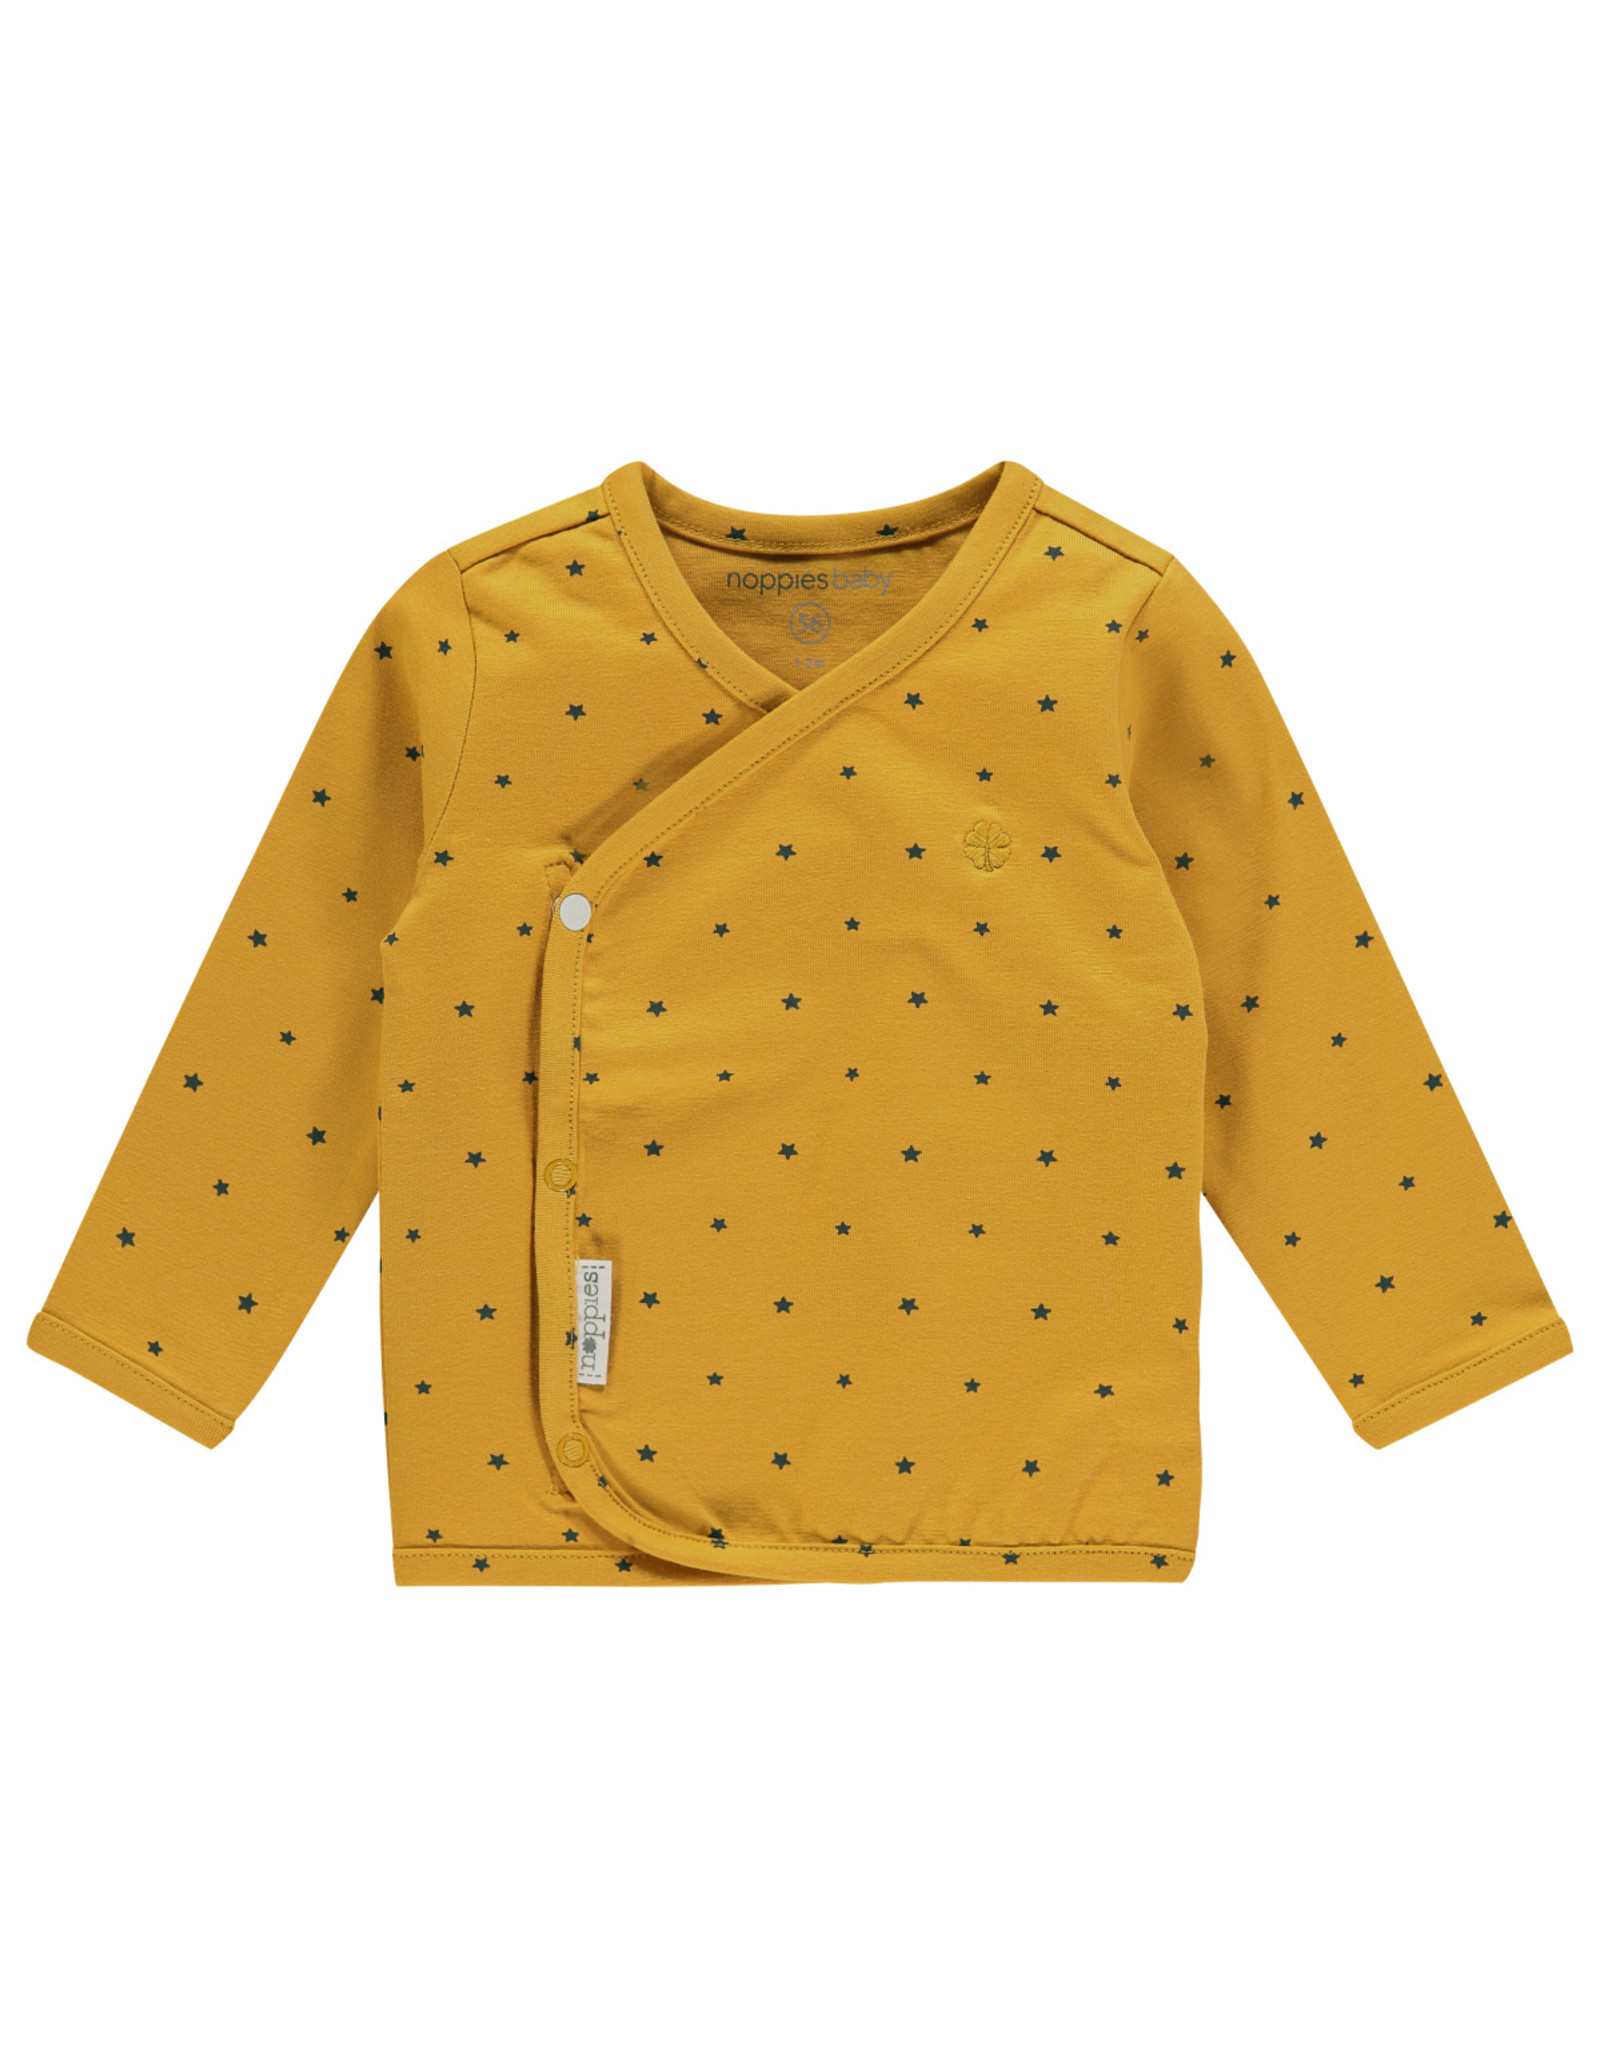 Noppies Unisex Longsleeve Taylot Honey Yellow